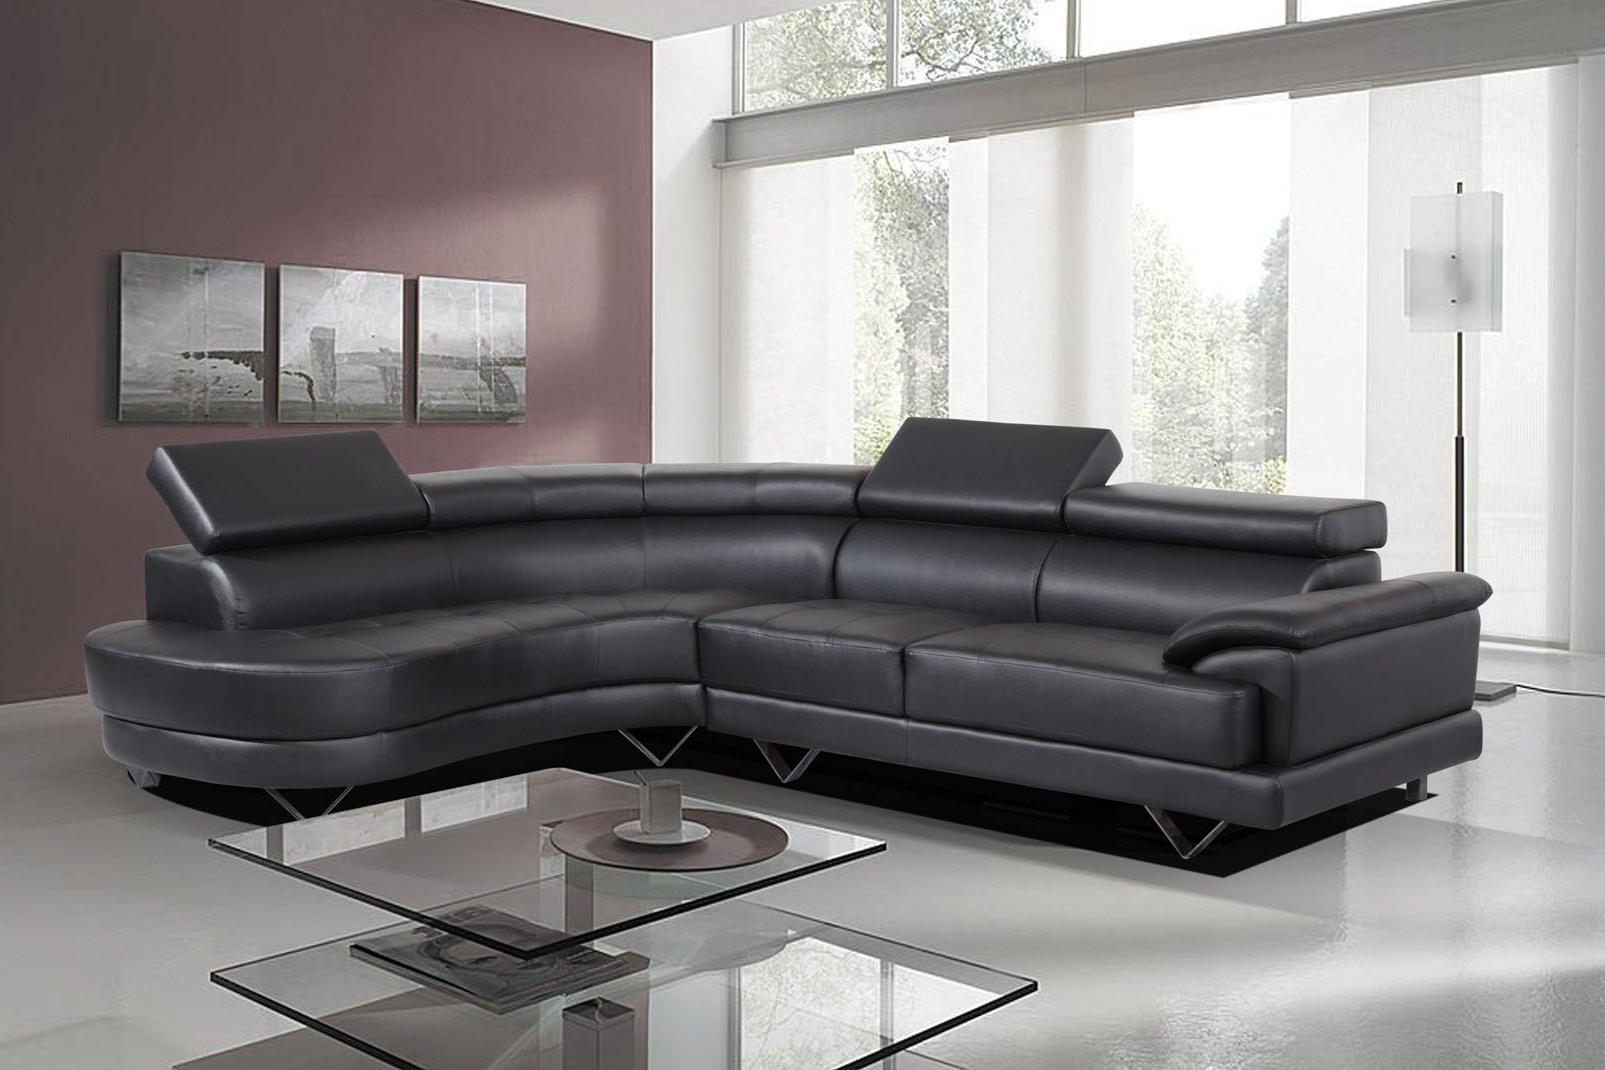 White Leather Corner Sofas Regarding Recent Furniture: Stunning Leather Corner Sofas Left Hand Corner Sofa (View 4 of 20)